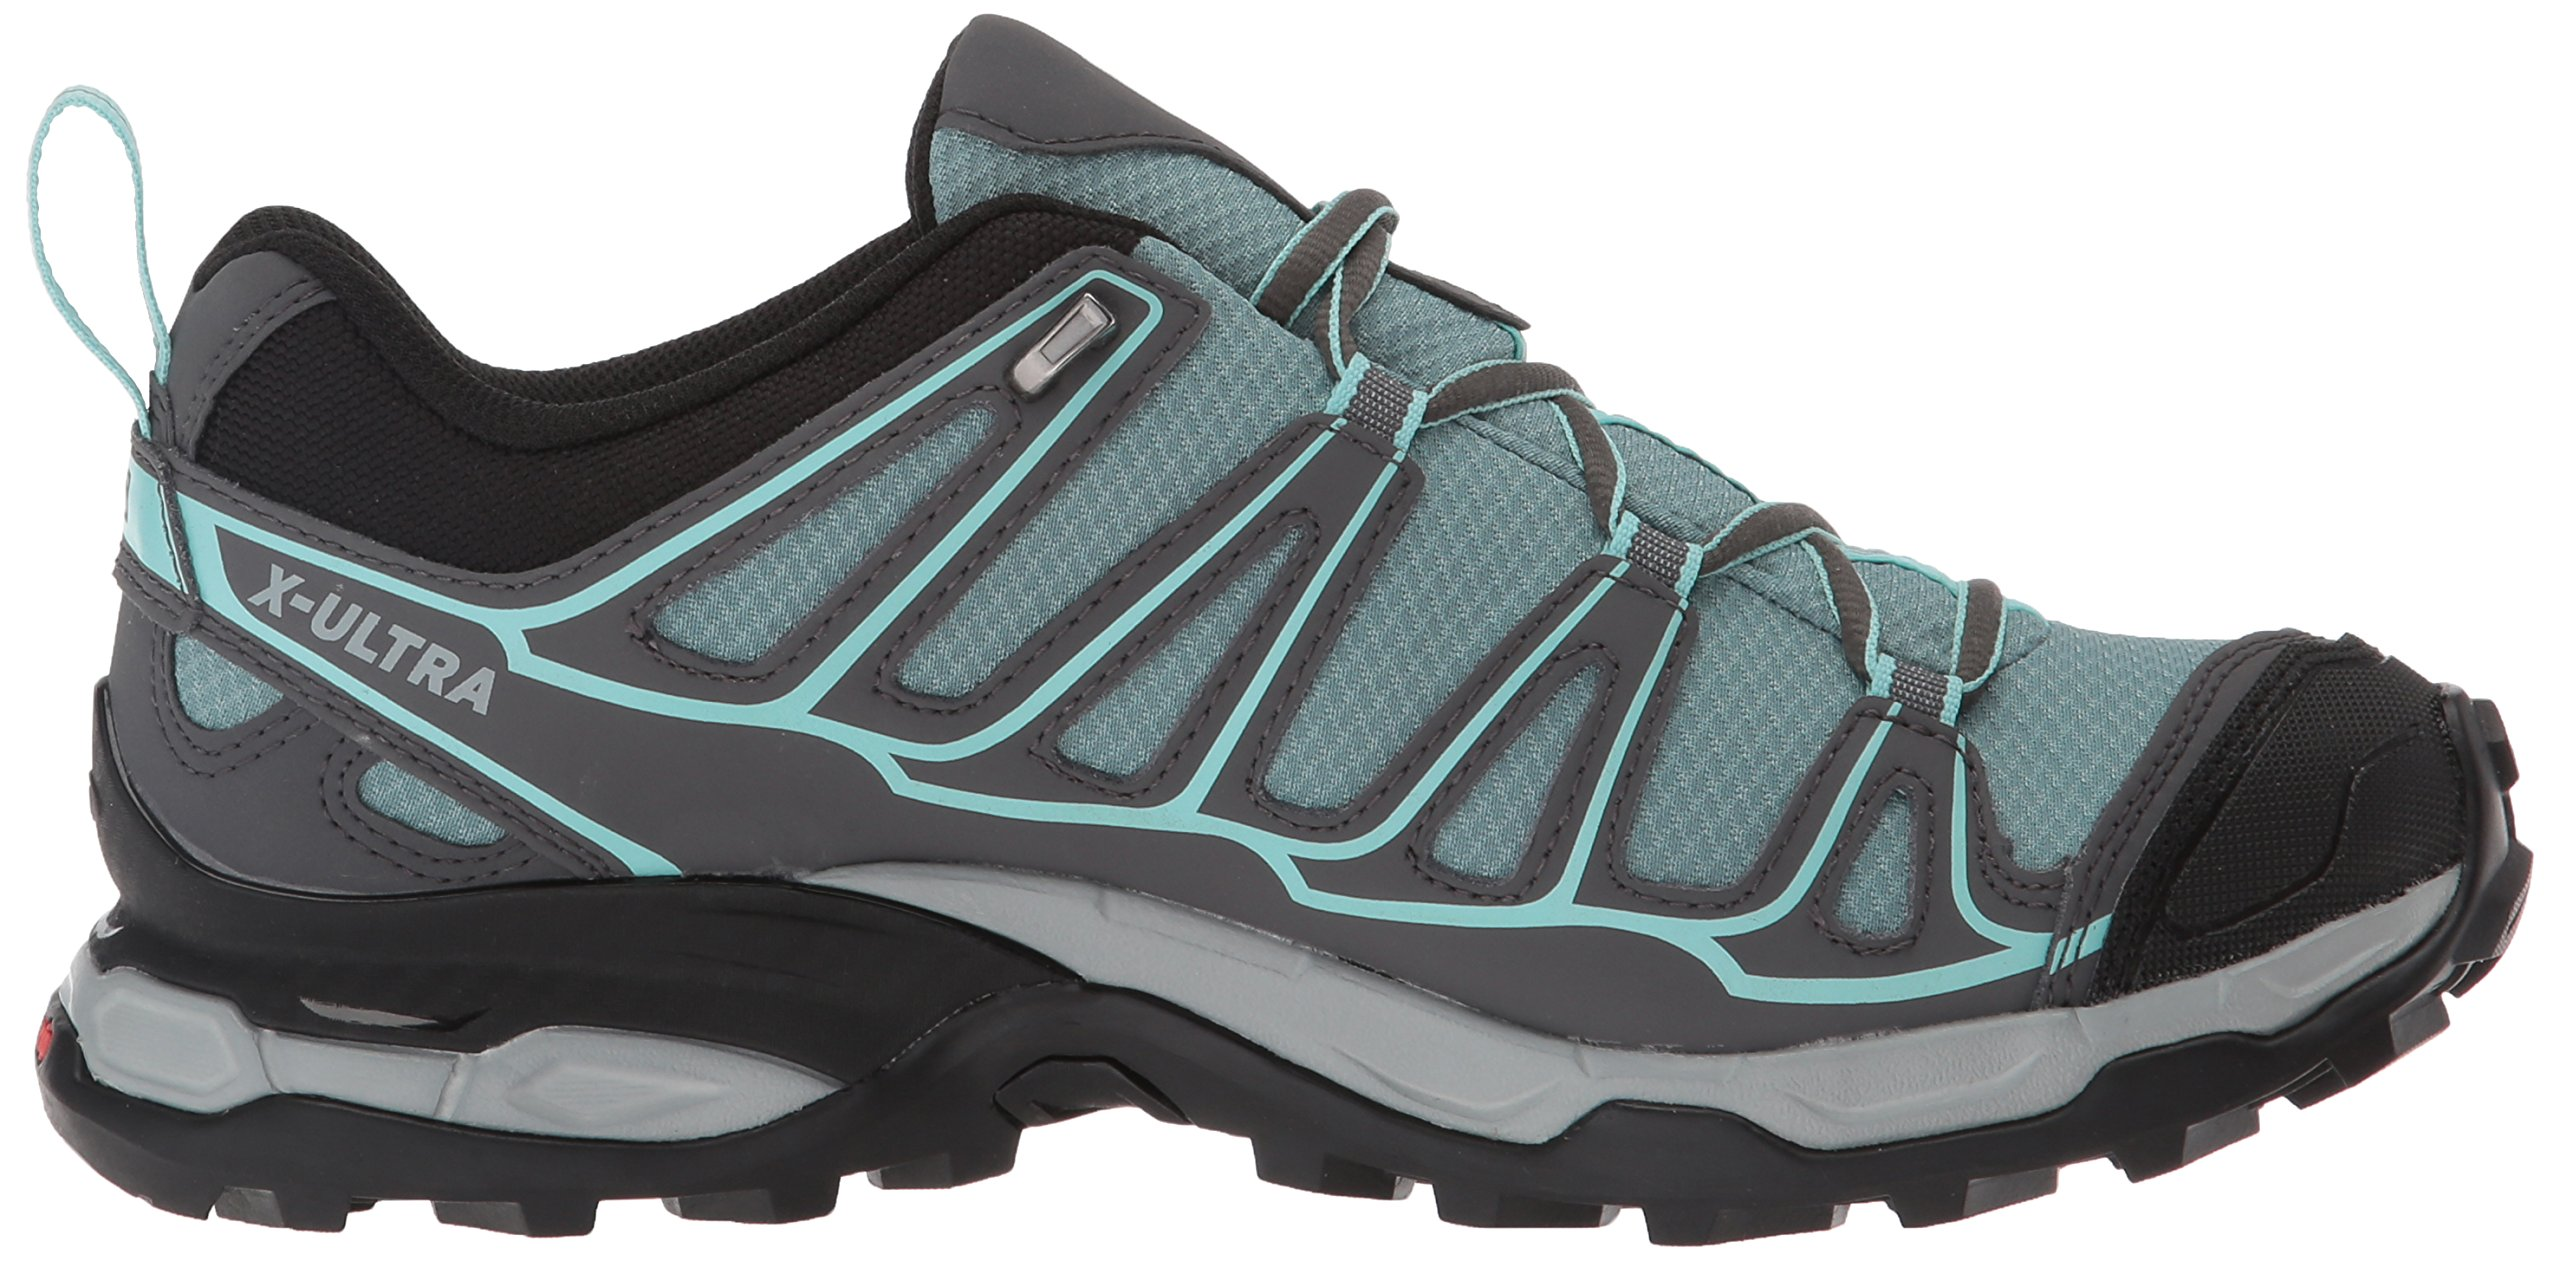 81zdE63Ts1L - SALOMON Women's Hiking Shoe